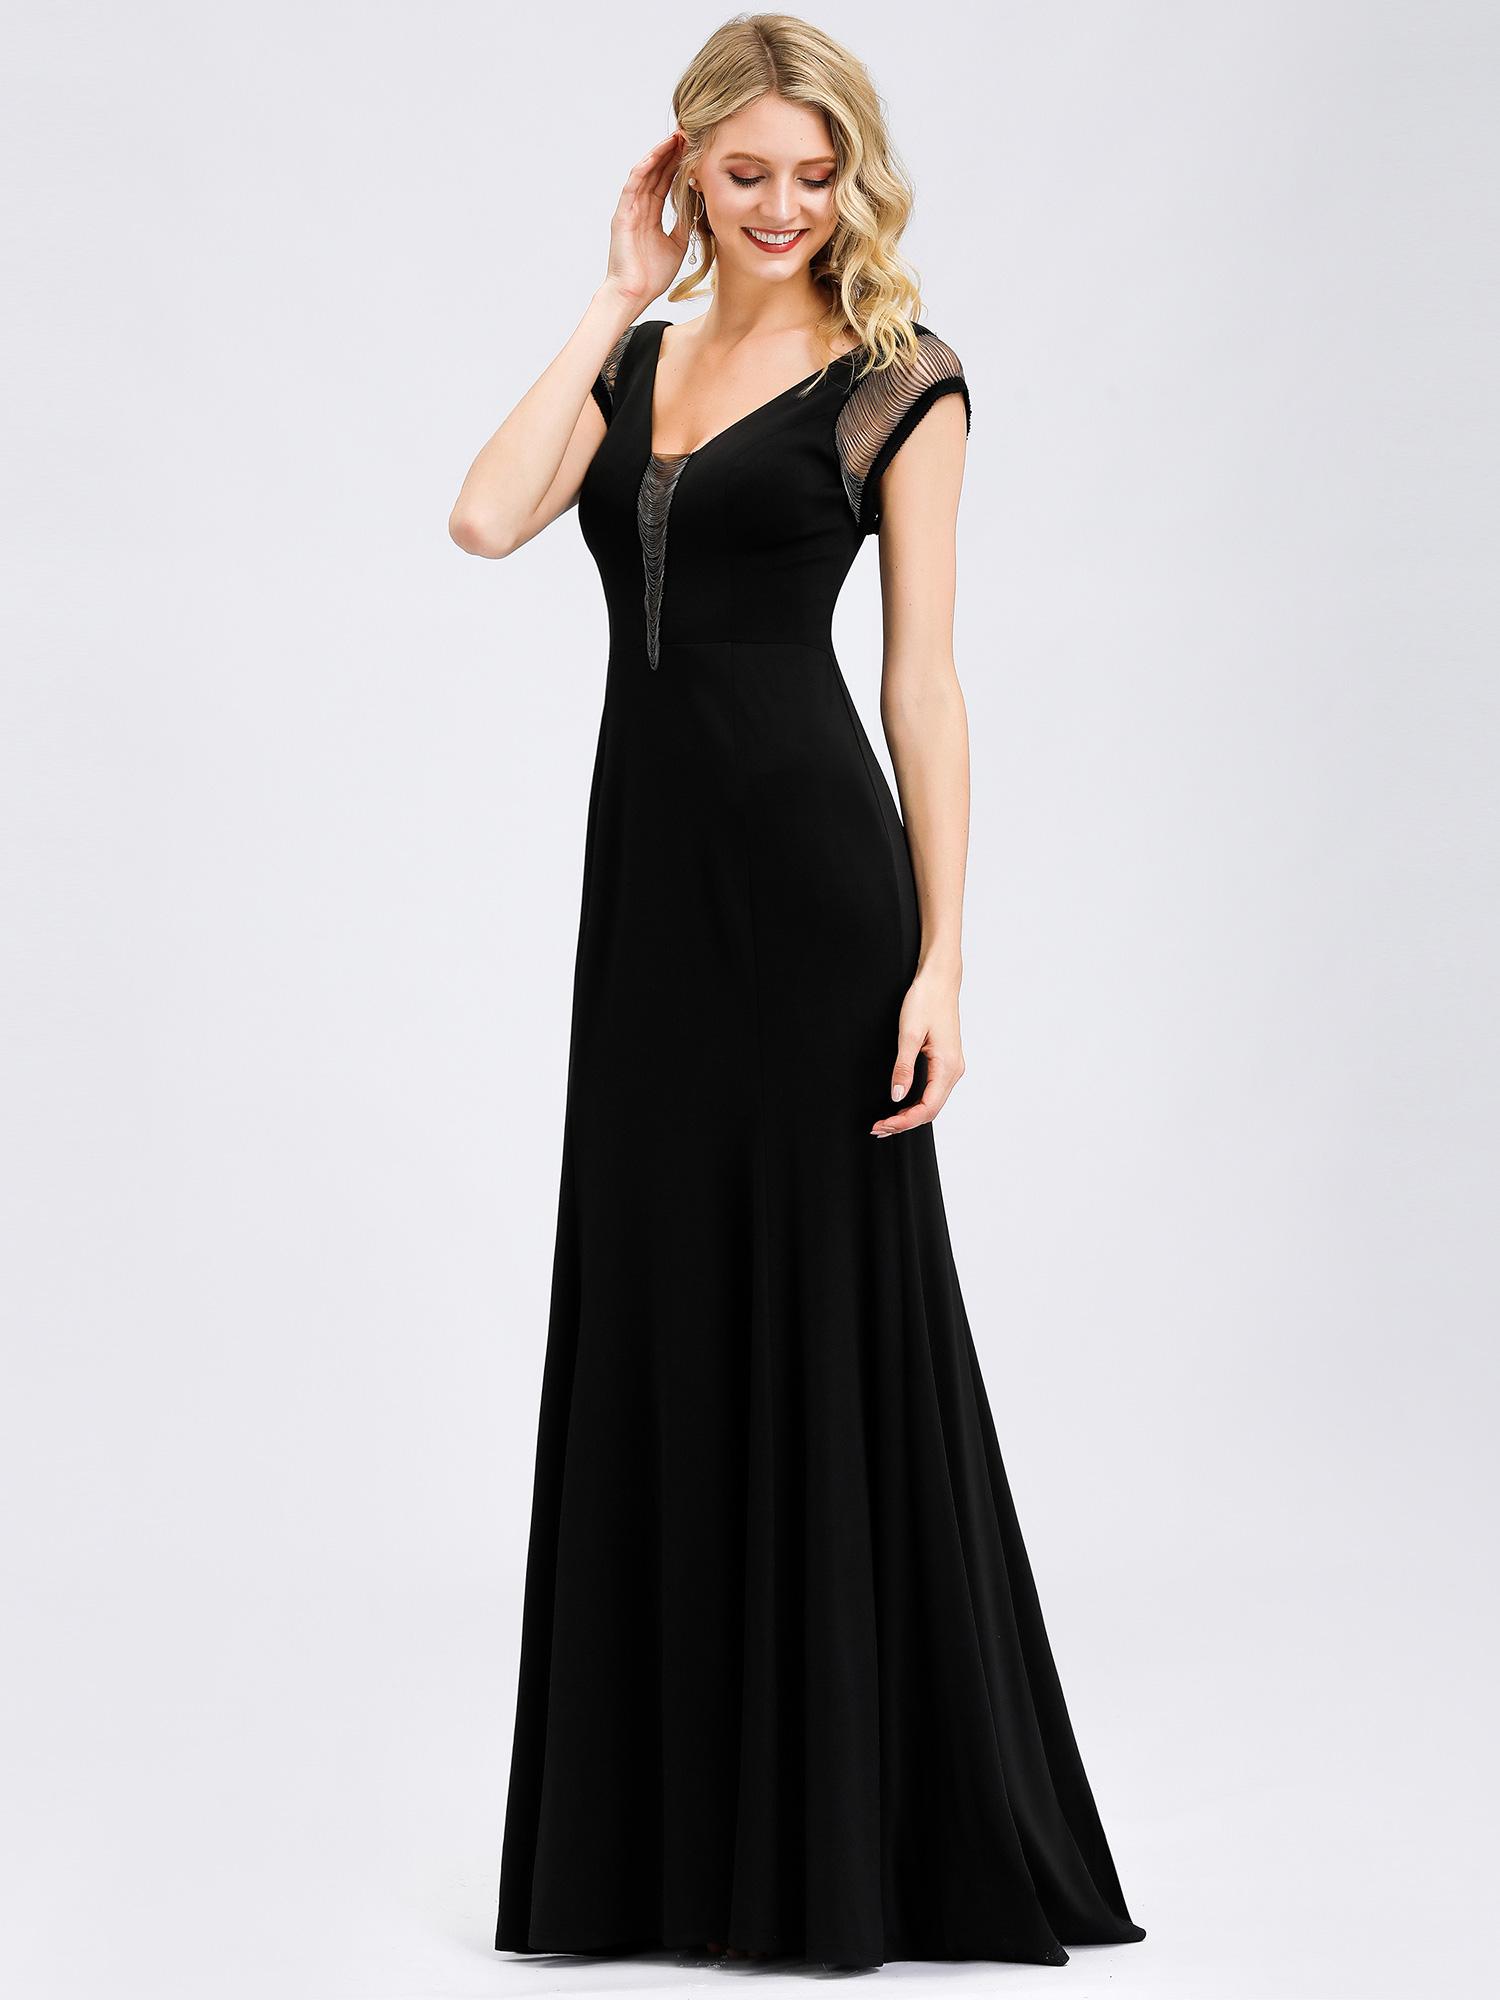 Ever-Pretty Black Formal Dresses Mermaid Party Dress Evening Ball ...